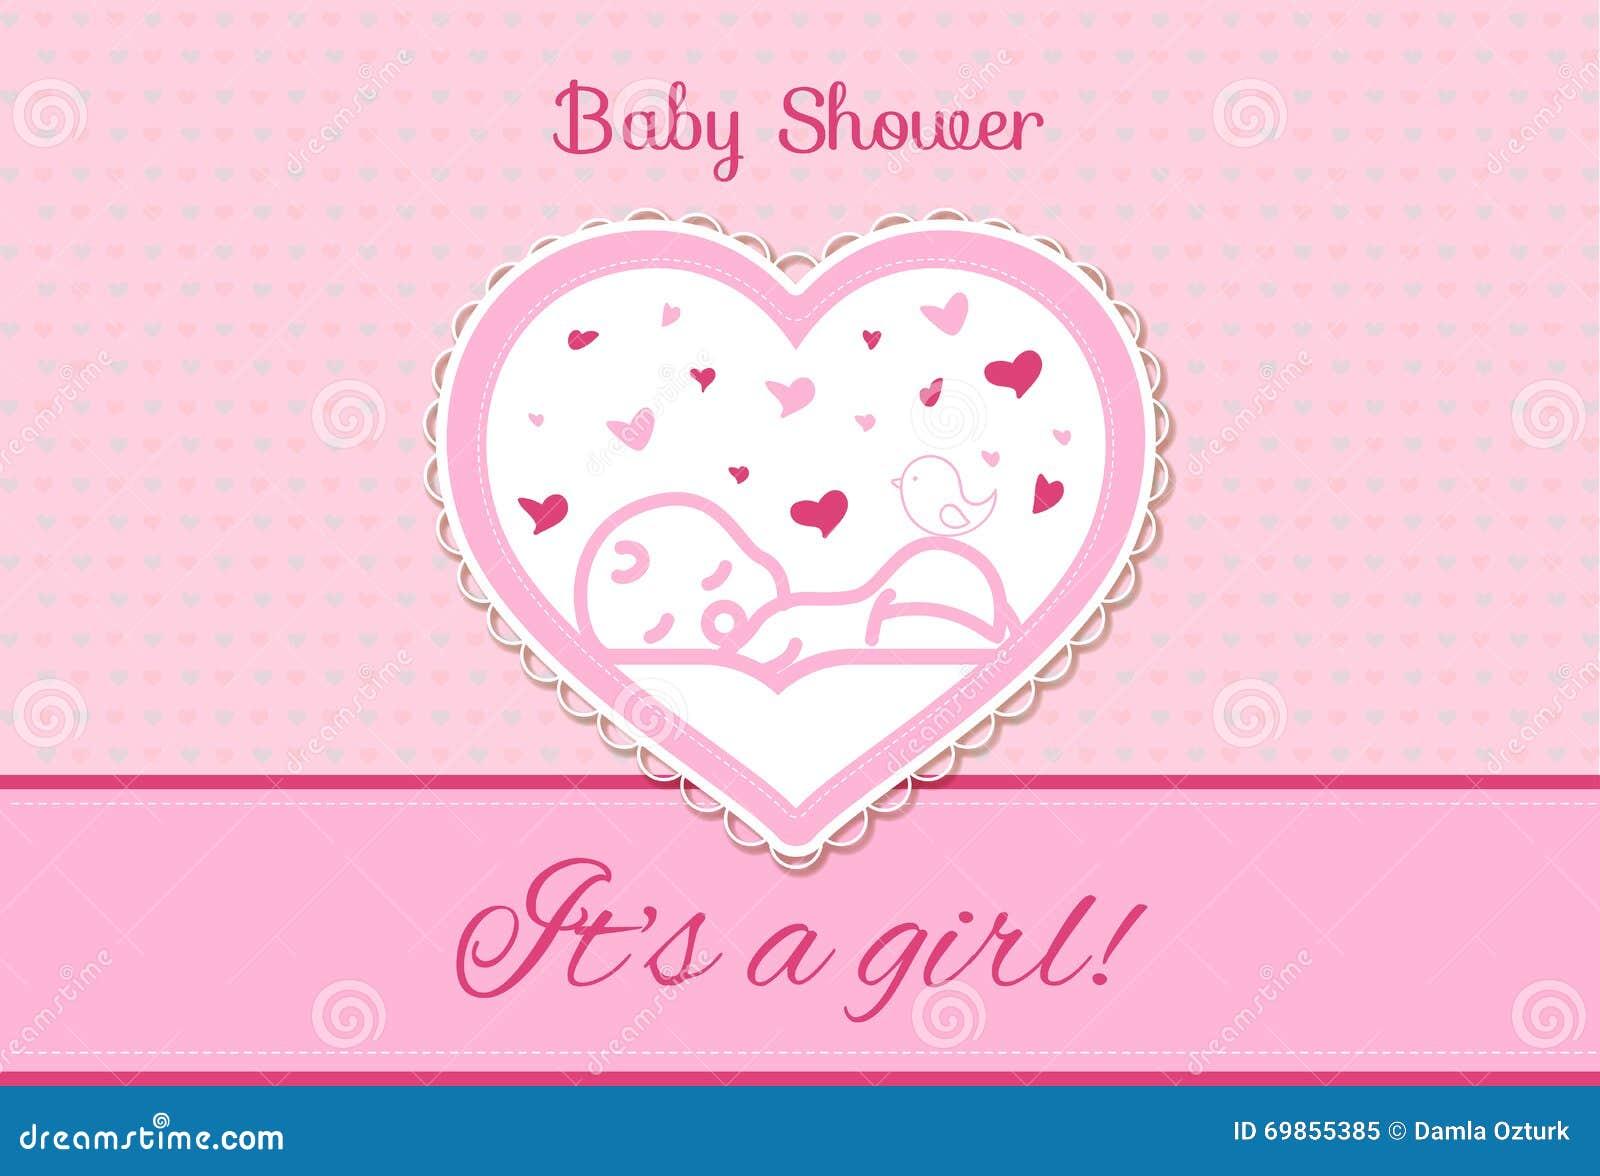 Sweet Baby Shower Invitation Card Design Stock Vector Illustration